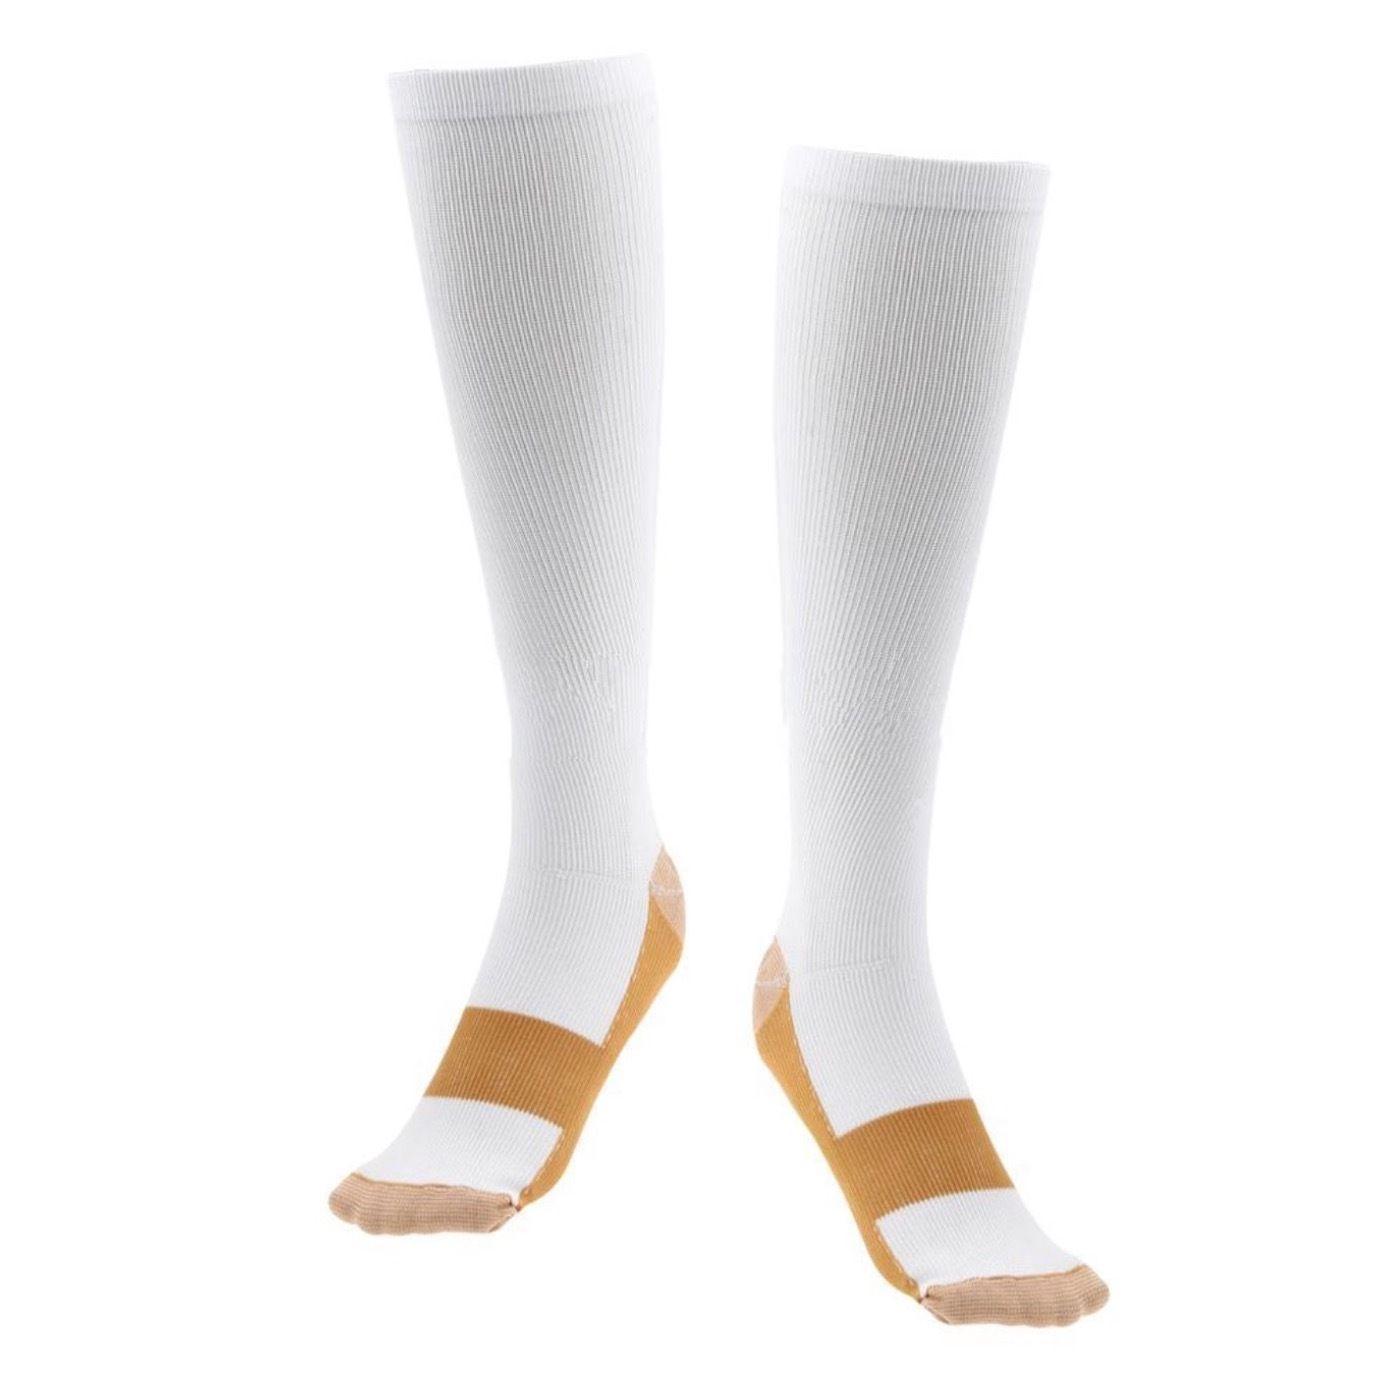 New Hot Sale Copper Infused Compression Socks Graduated Men Women Unisex Crew Socks S-XXL